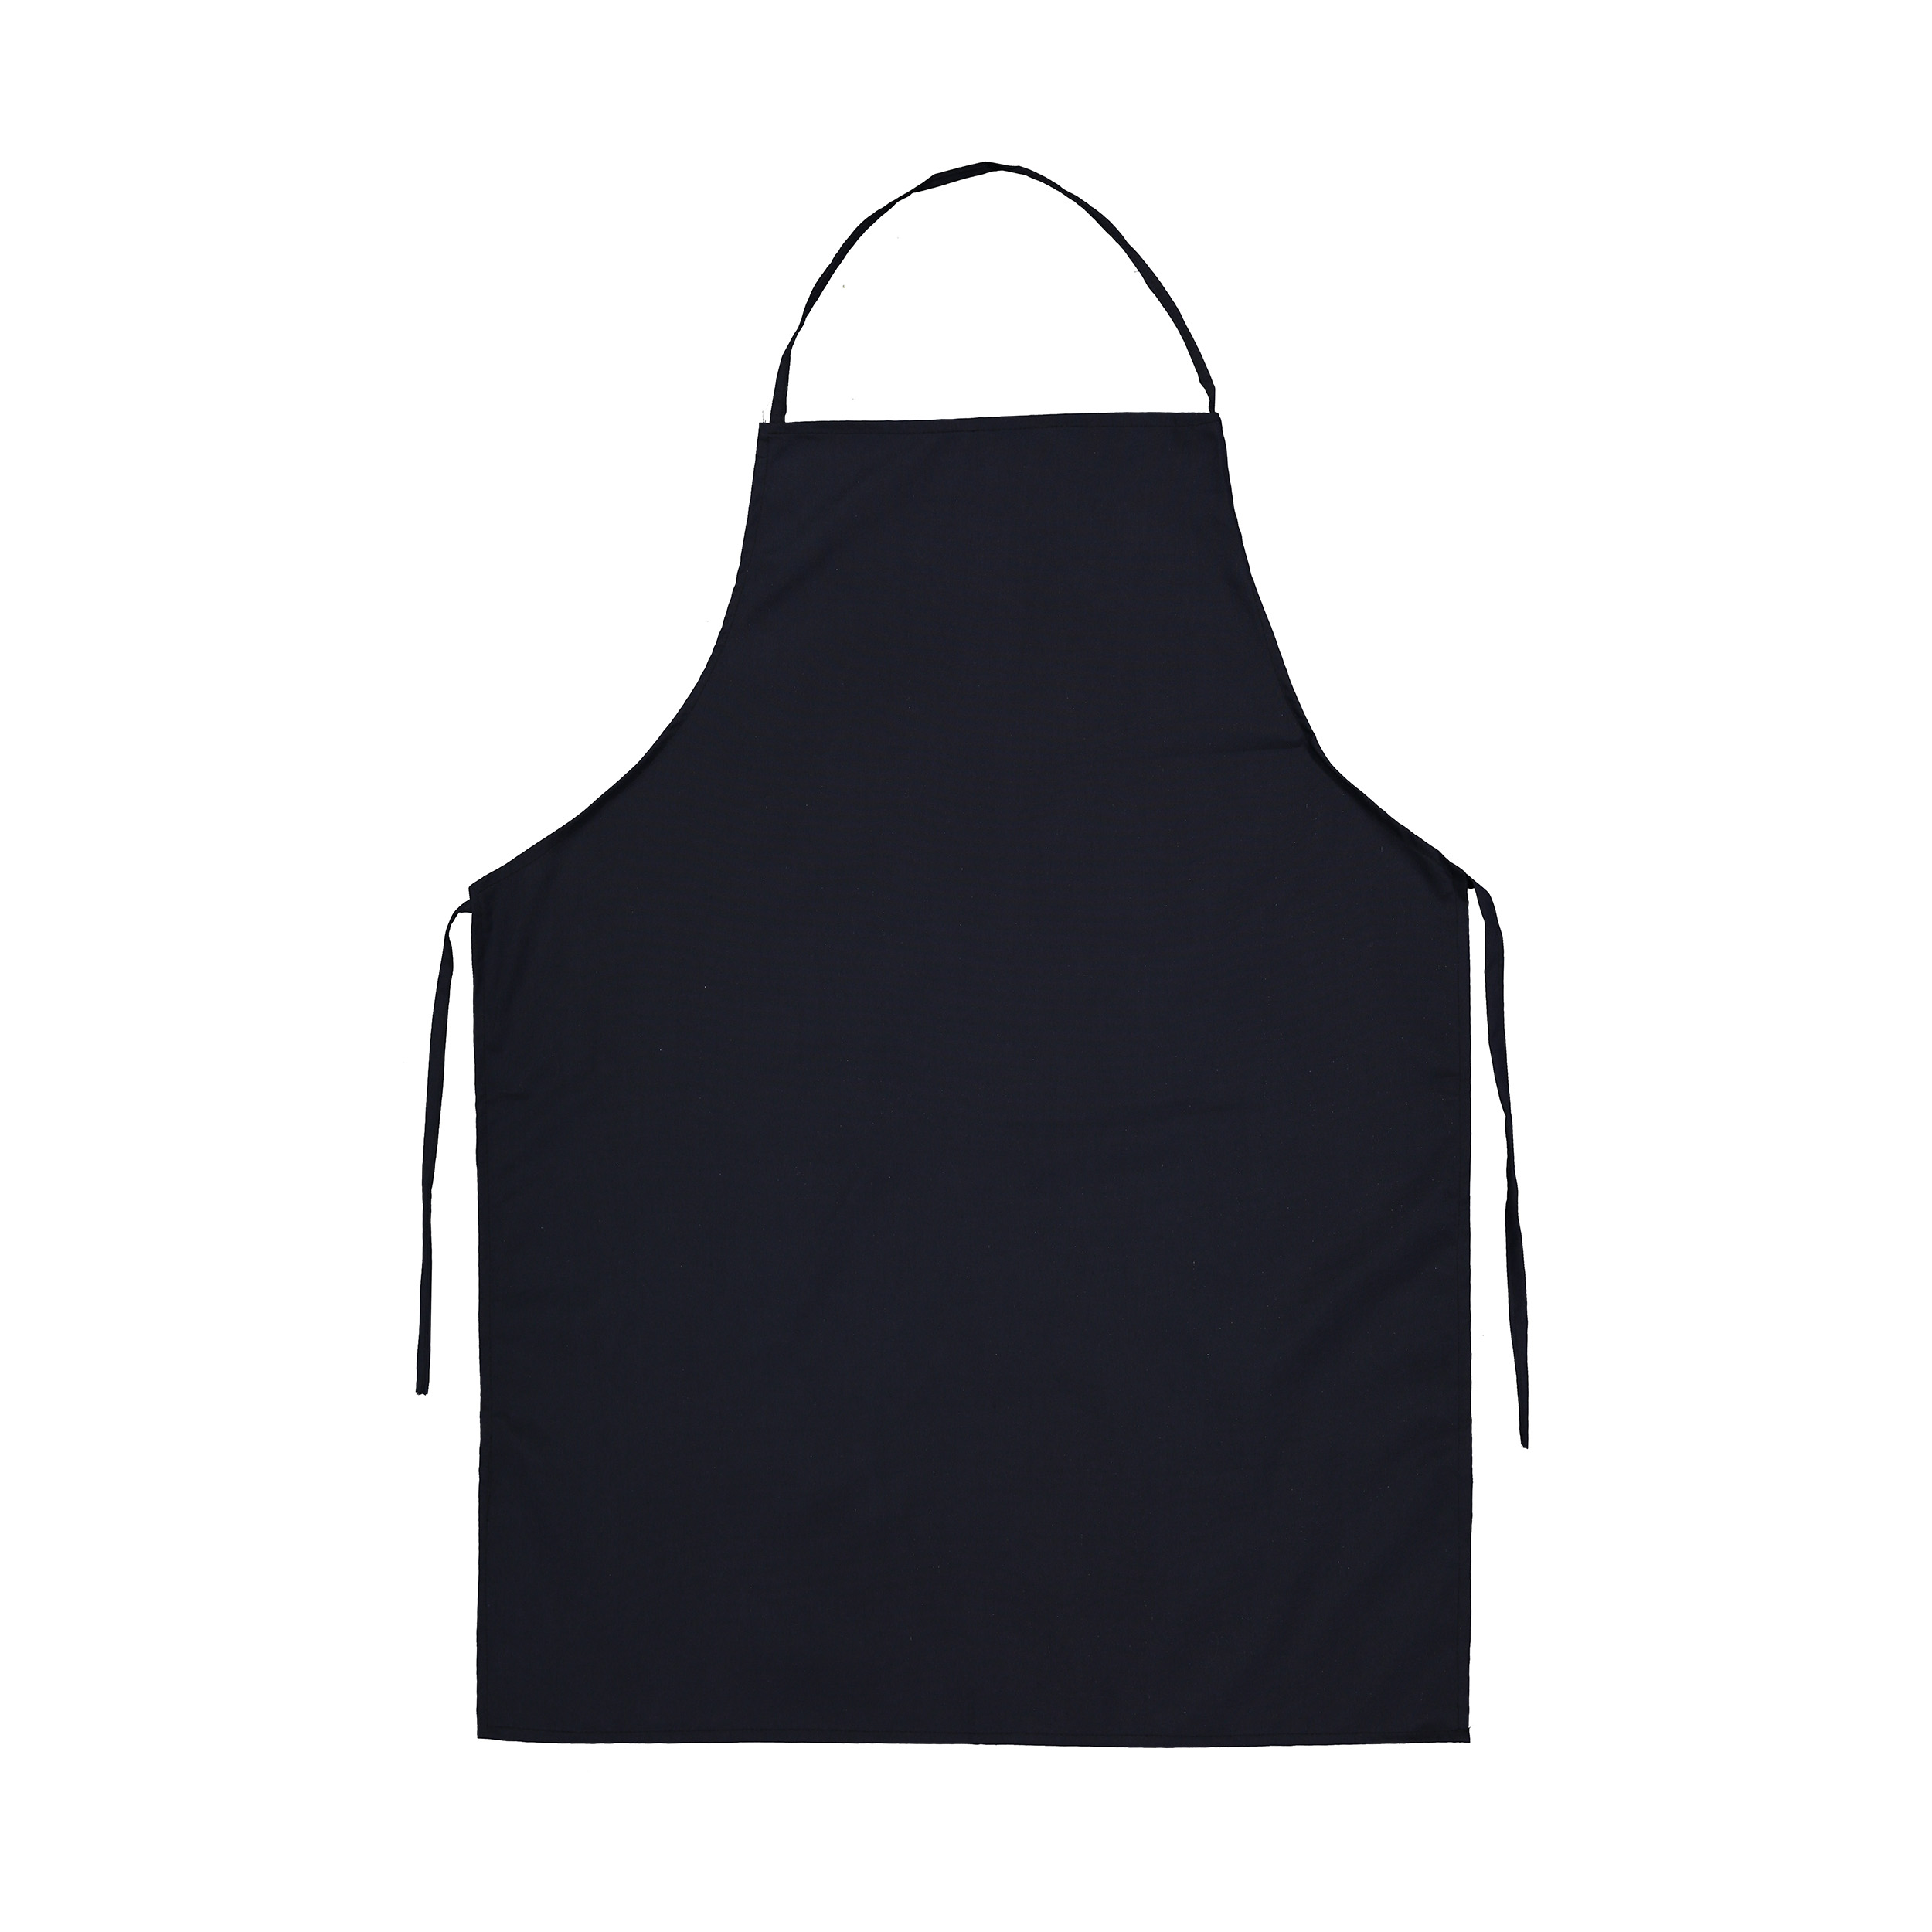 پیش بند آشپزخانه کد S1